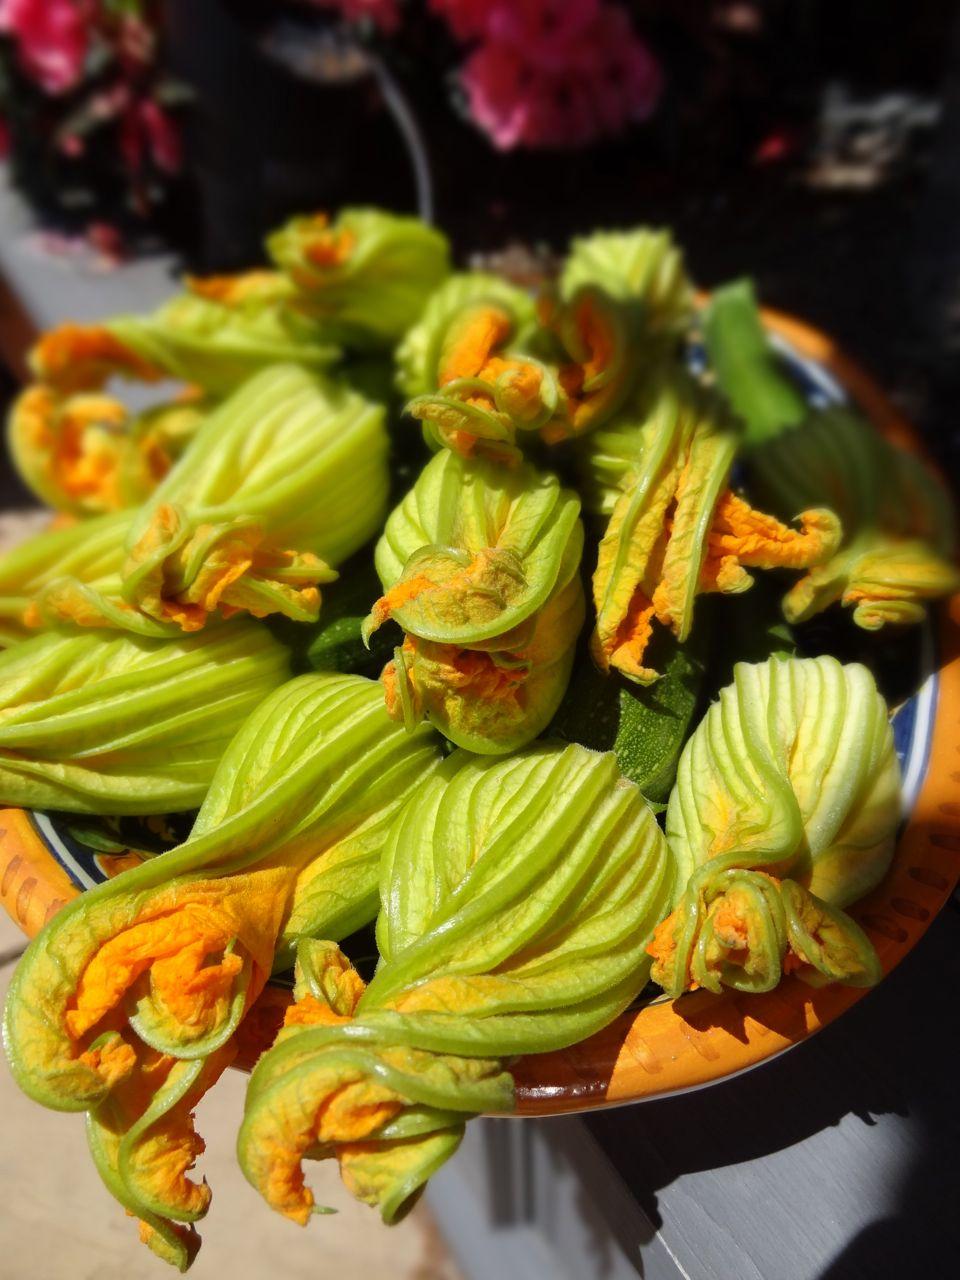 Scrumpdillyicious: Fried Ricotta Stuffed Zucchini Flowers